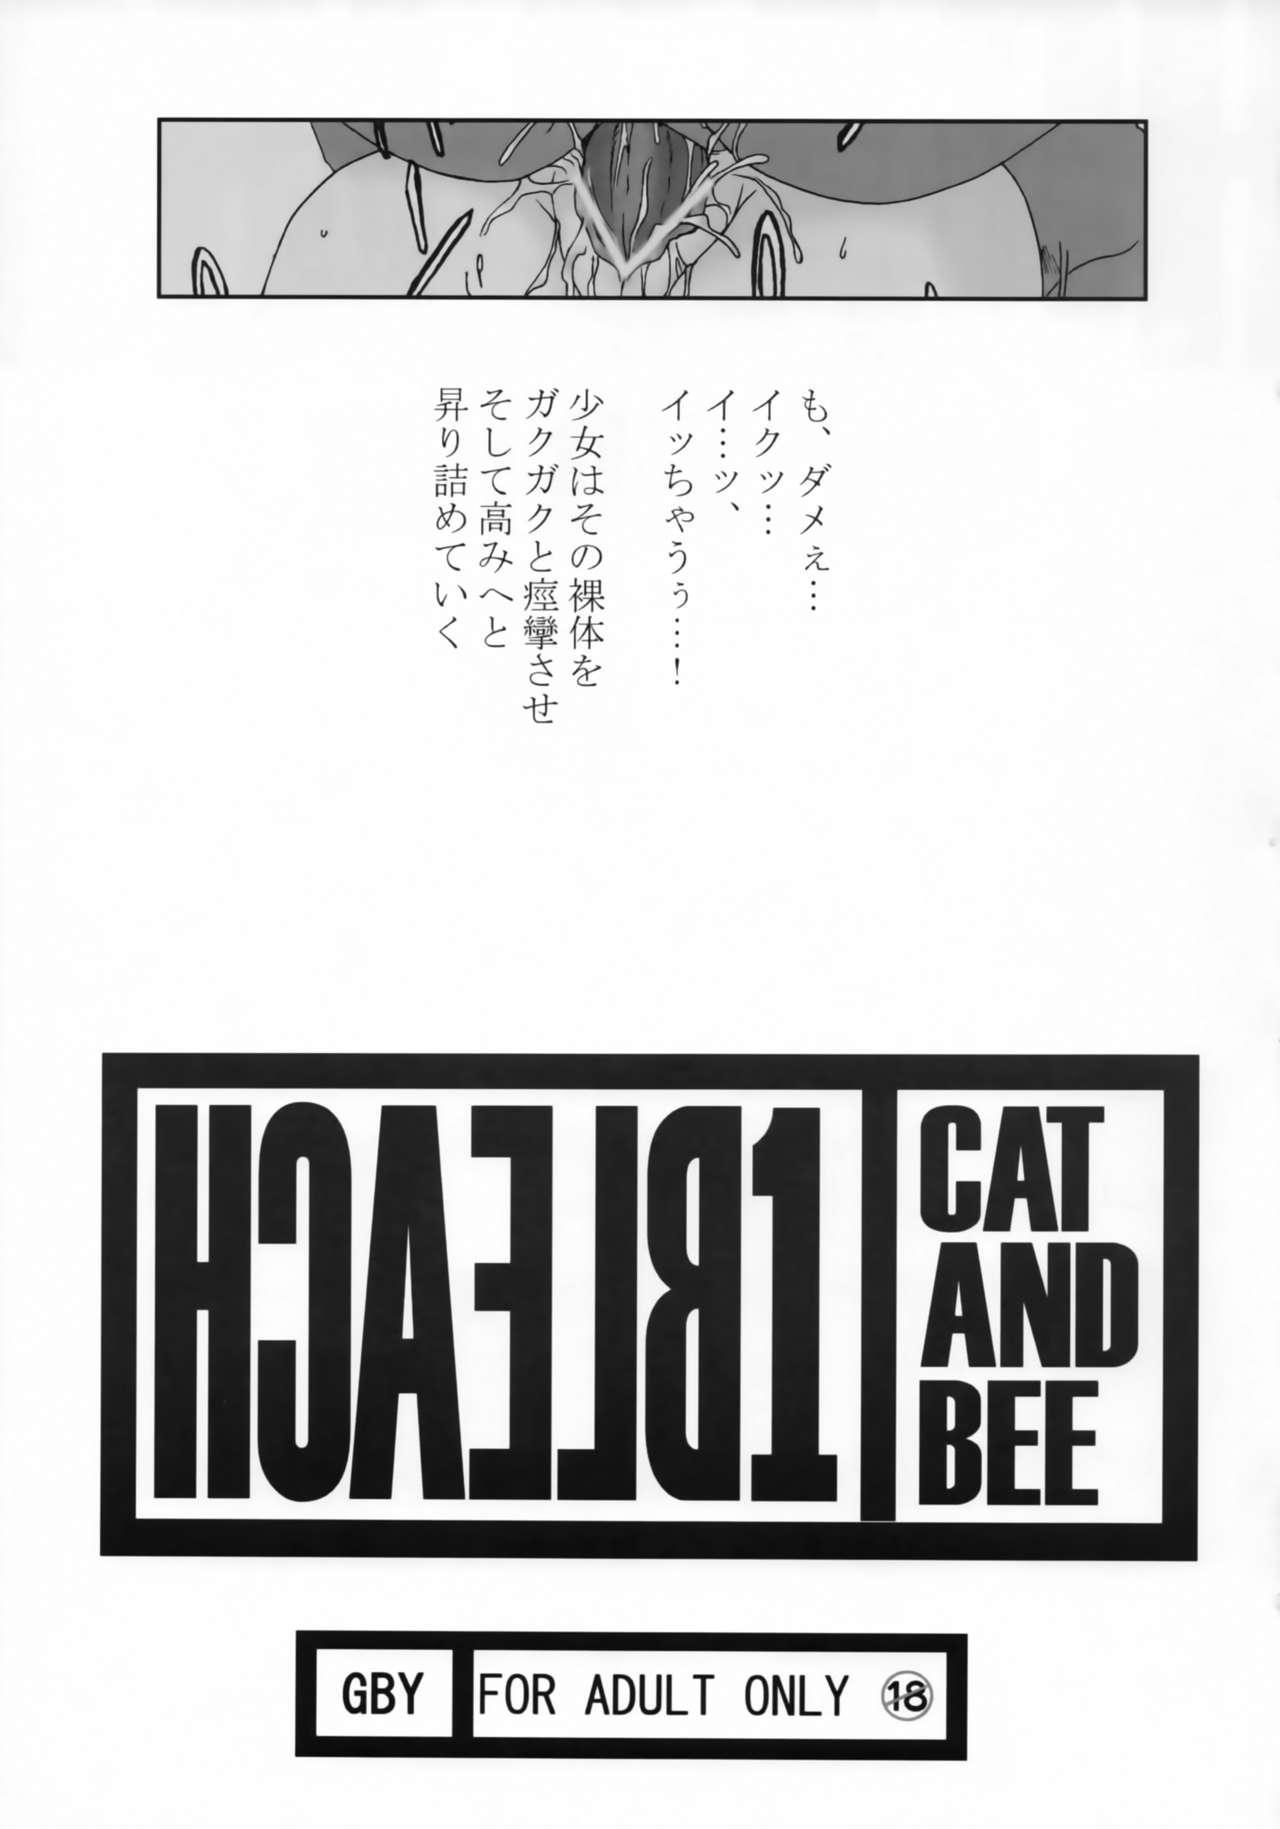 HCAELB 1